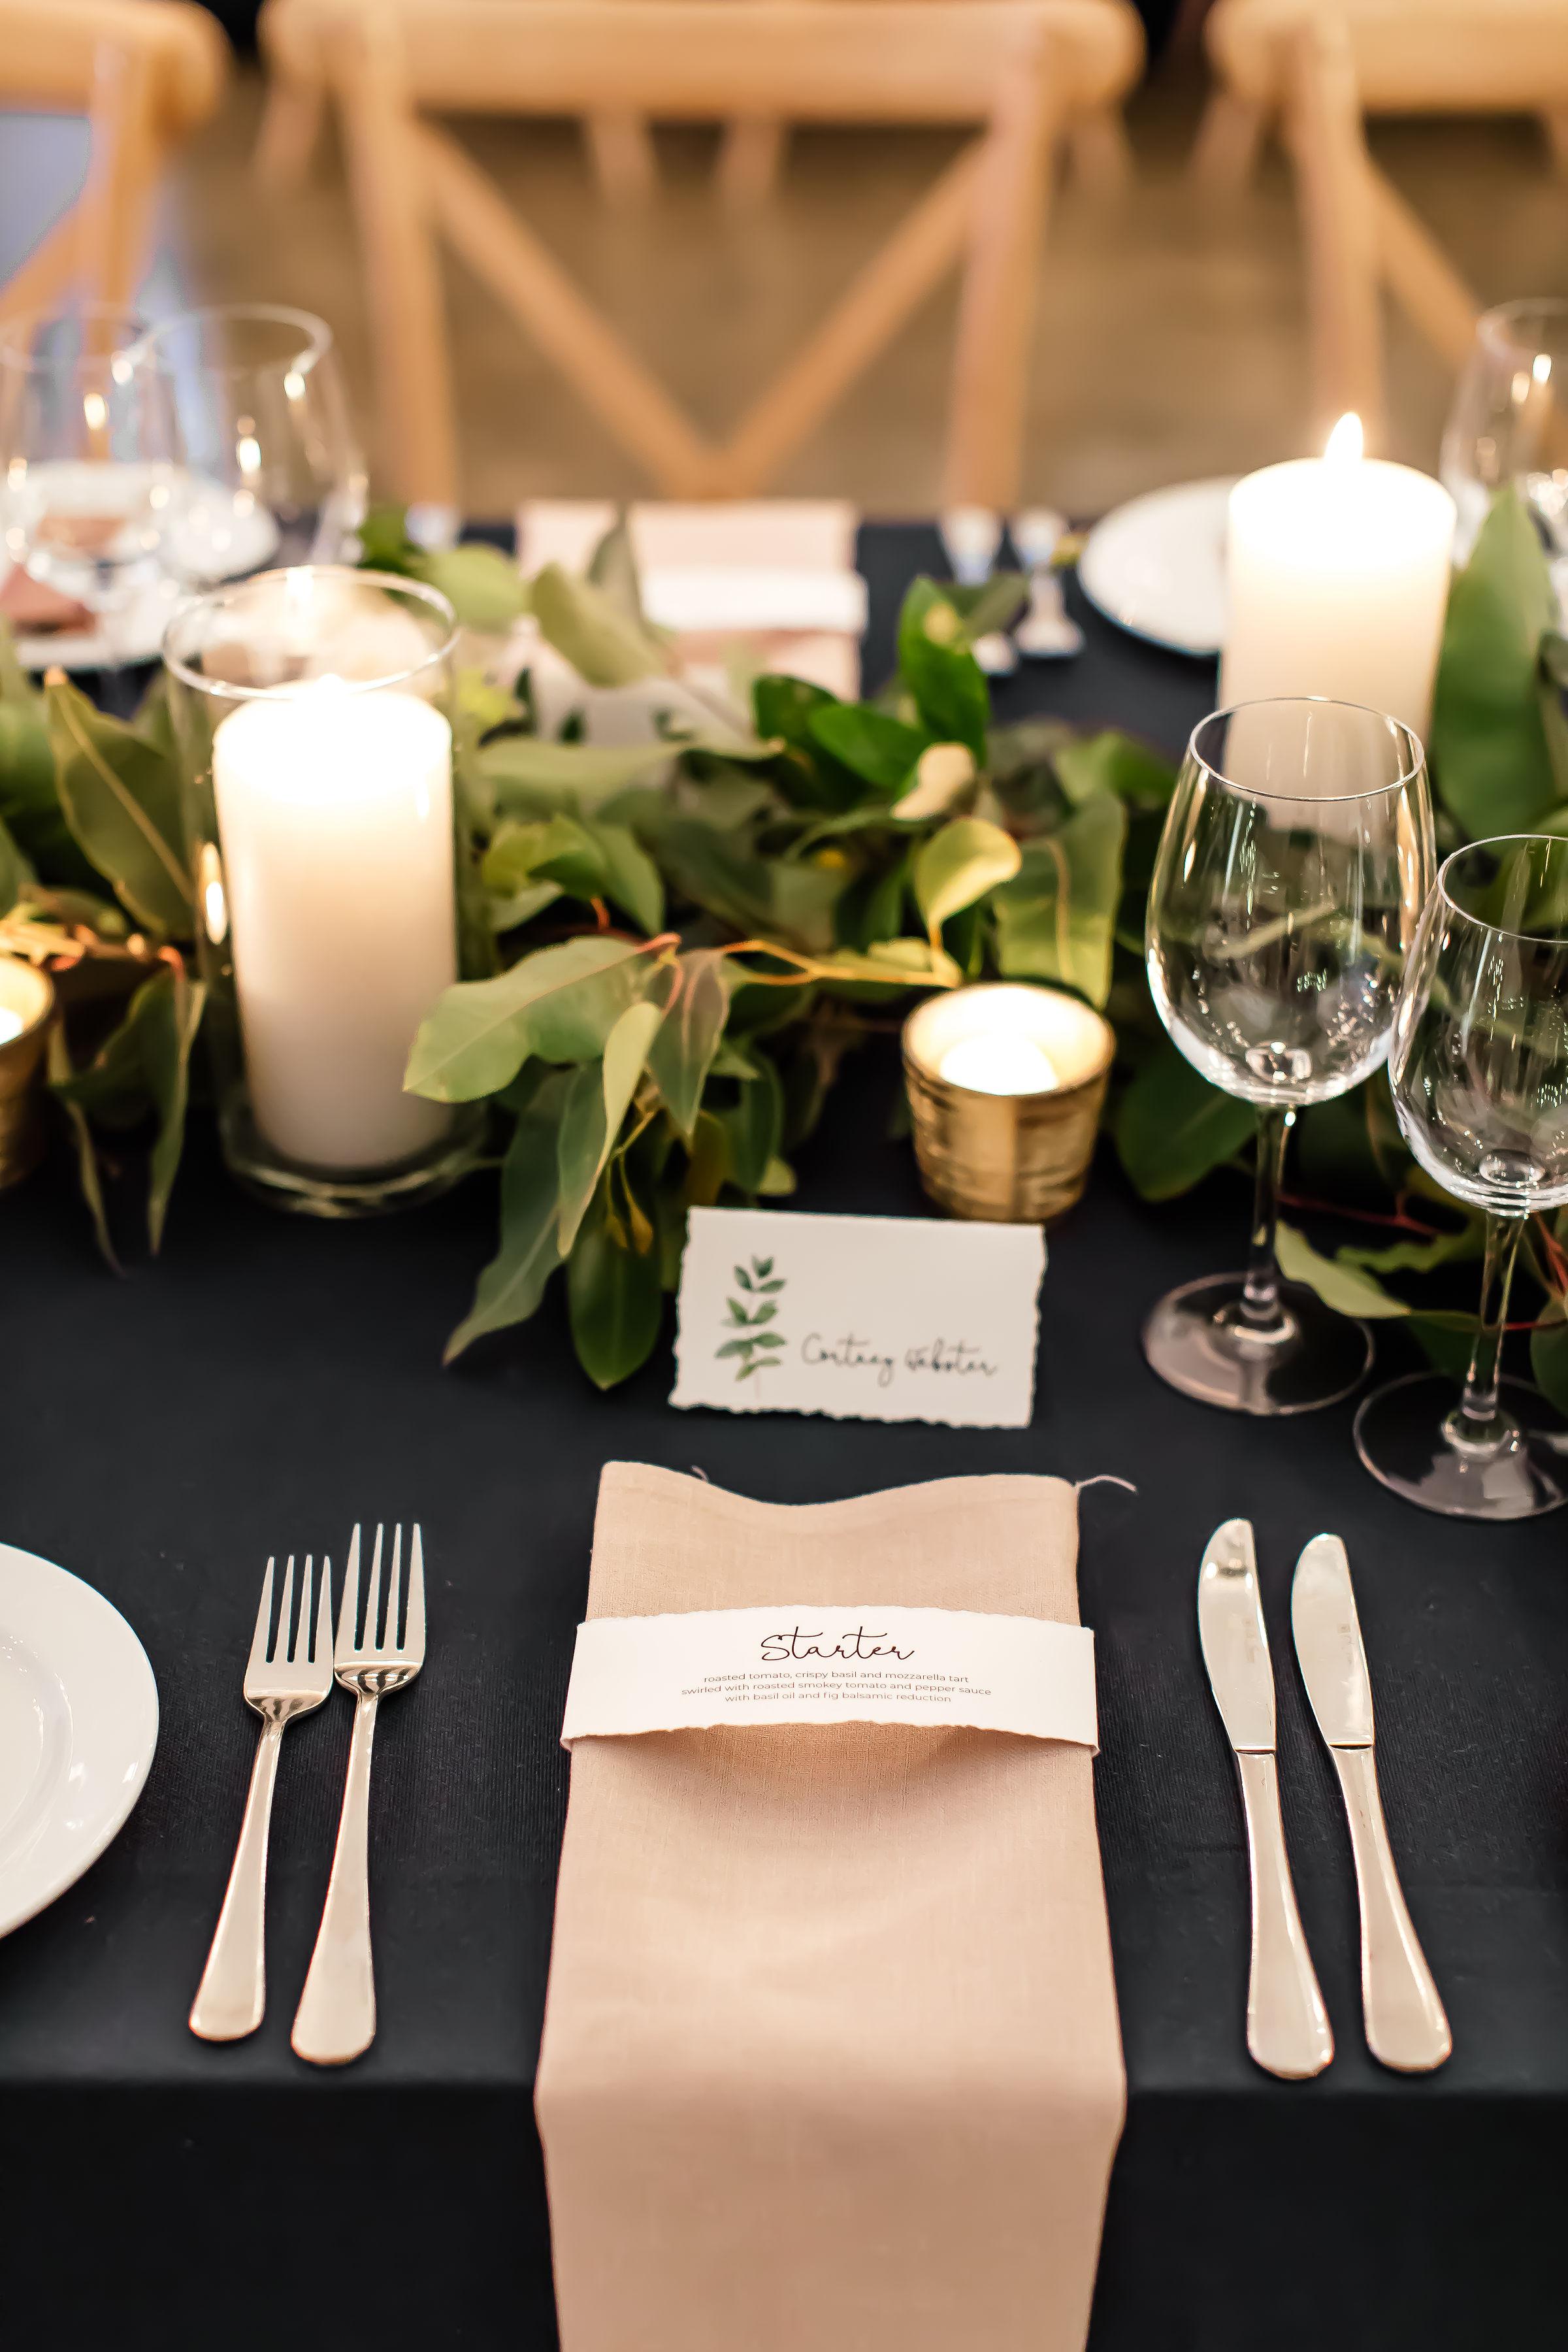 Wedding Stationery & Decorations.jpg